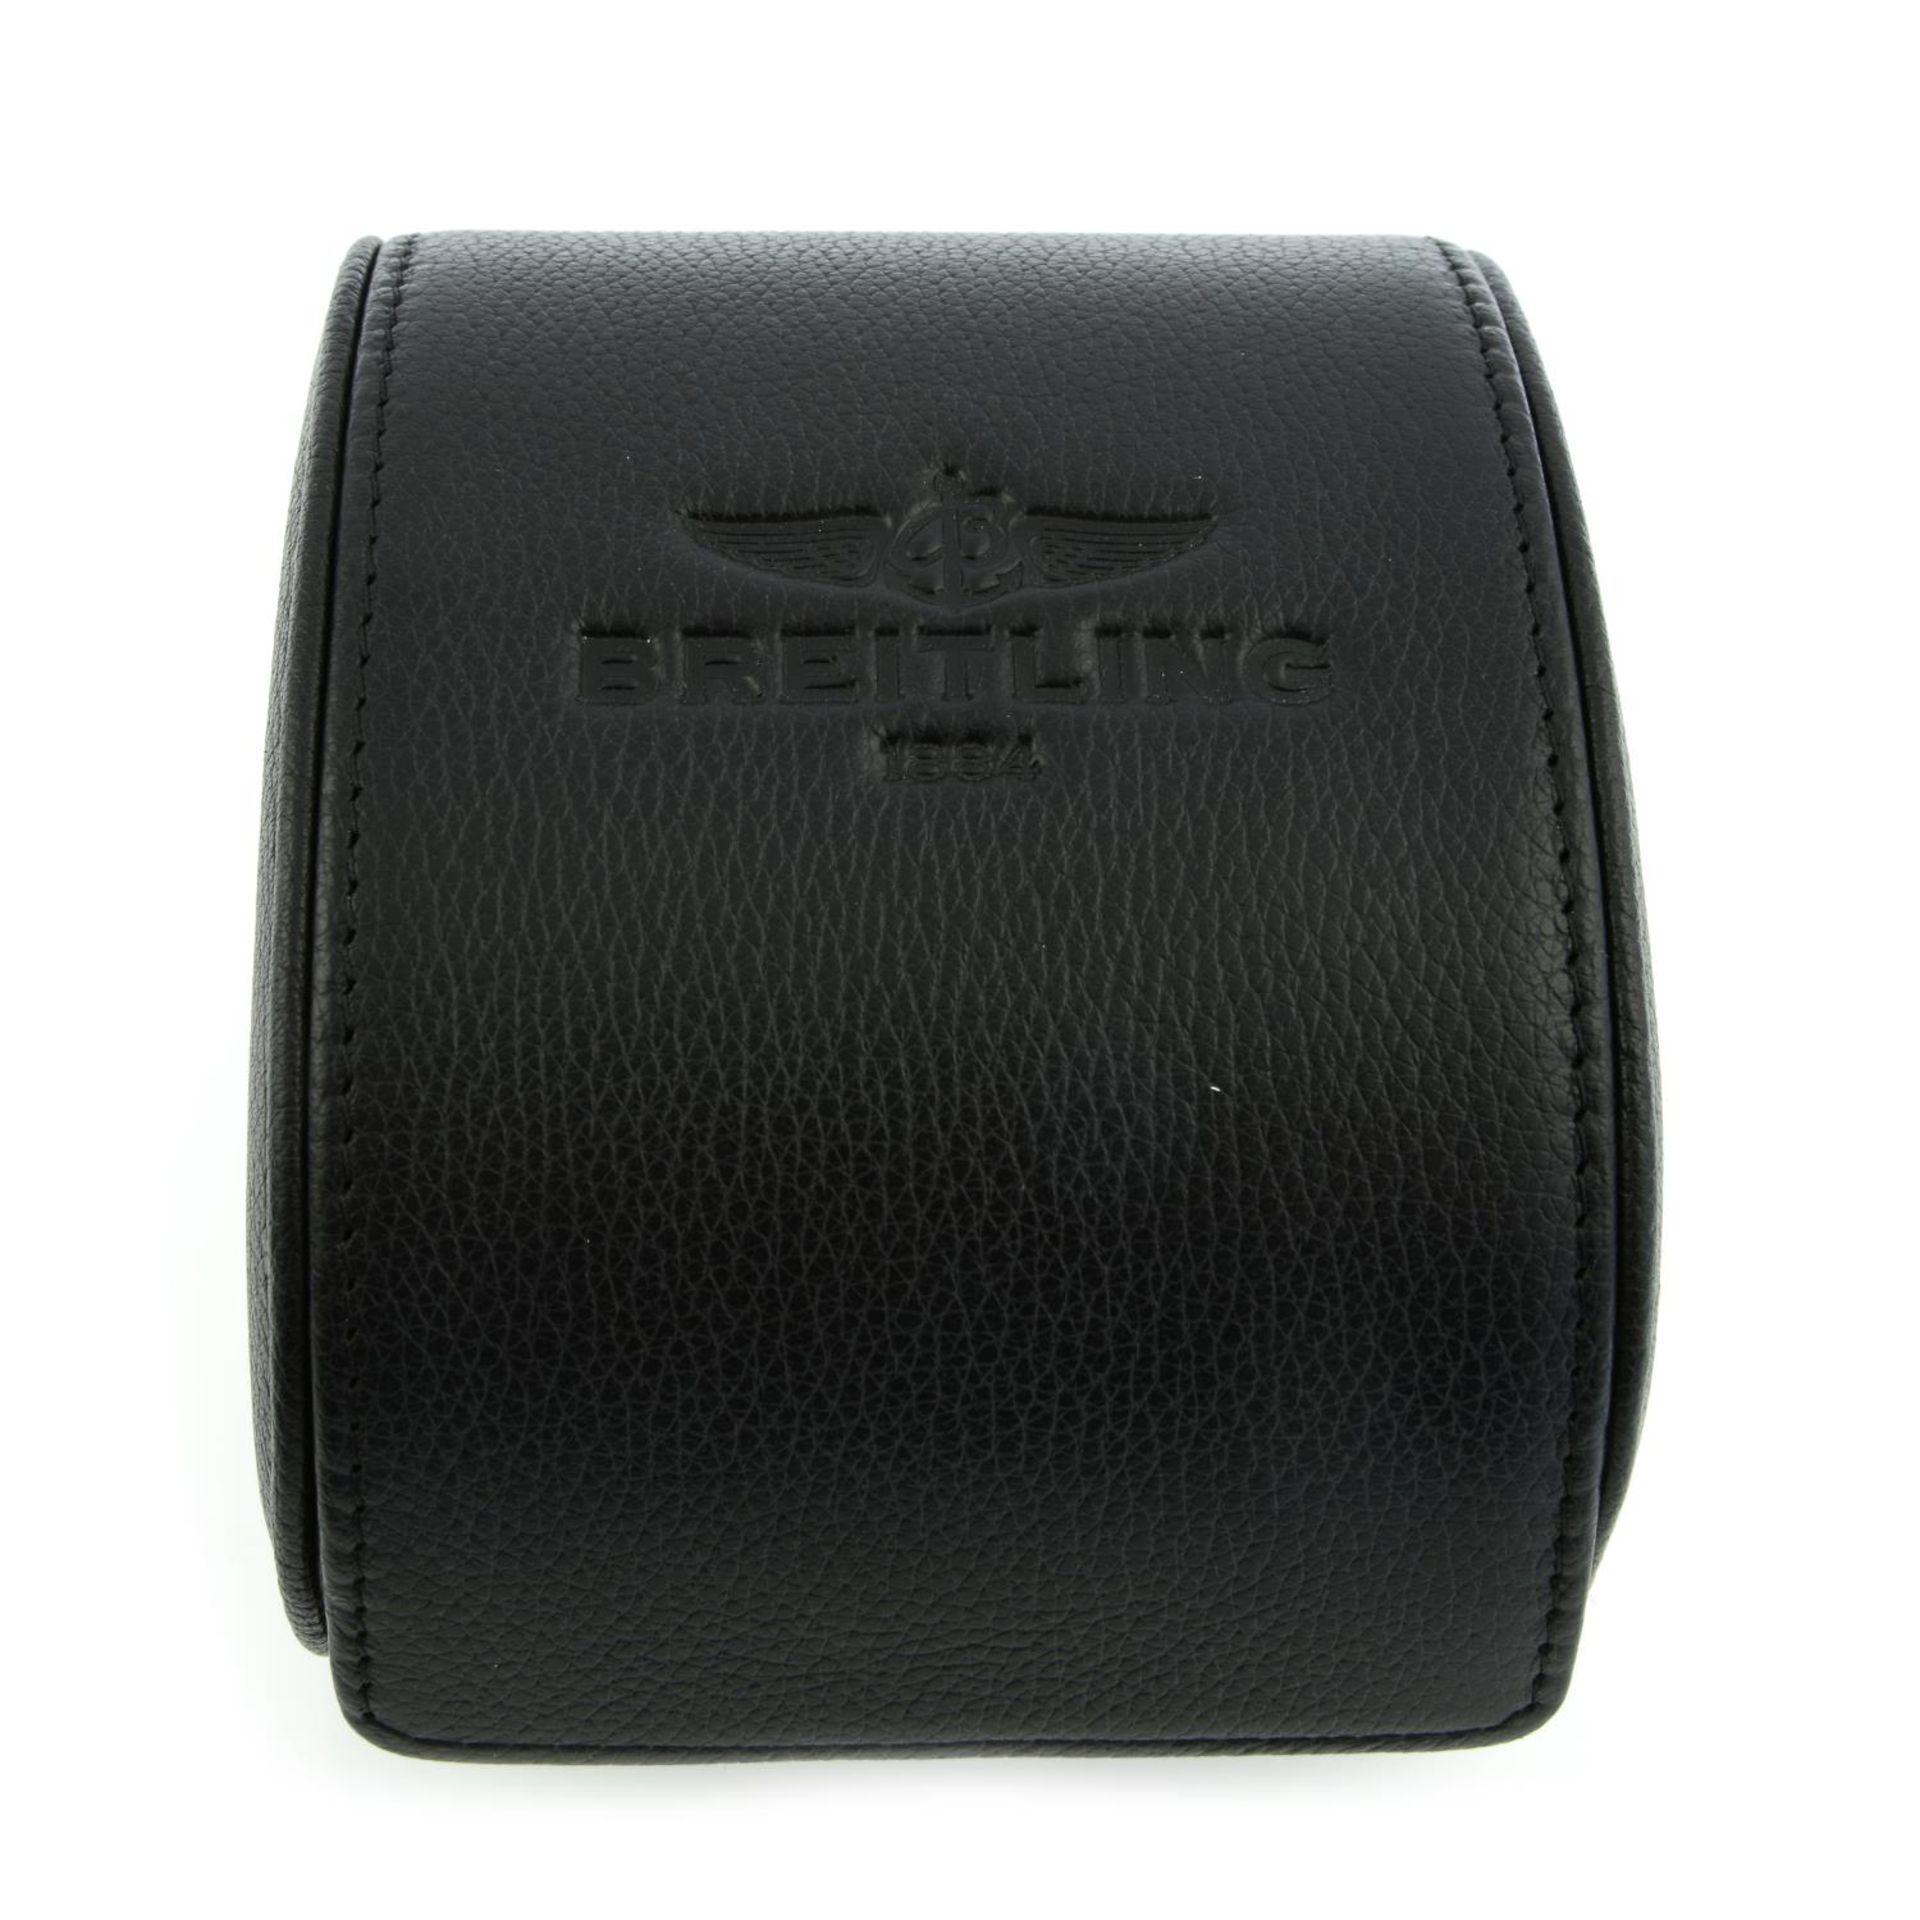 BREITLING - a SuperOcean Heritage 46 bracelet watch. - Bild 6 aus 6